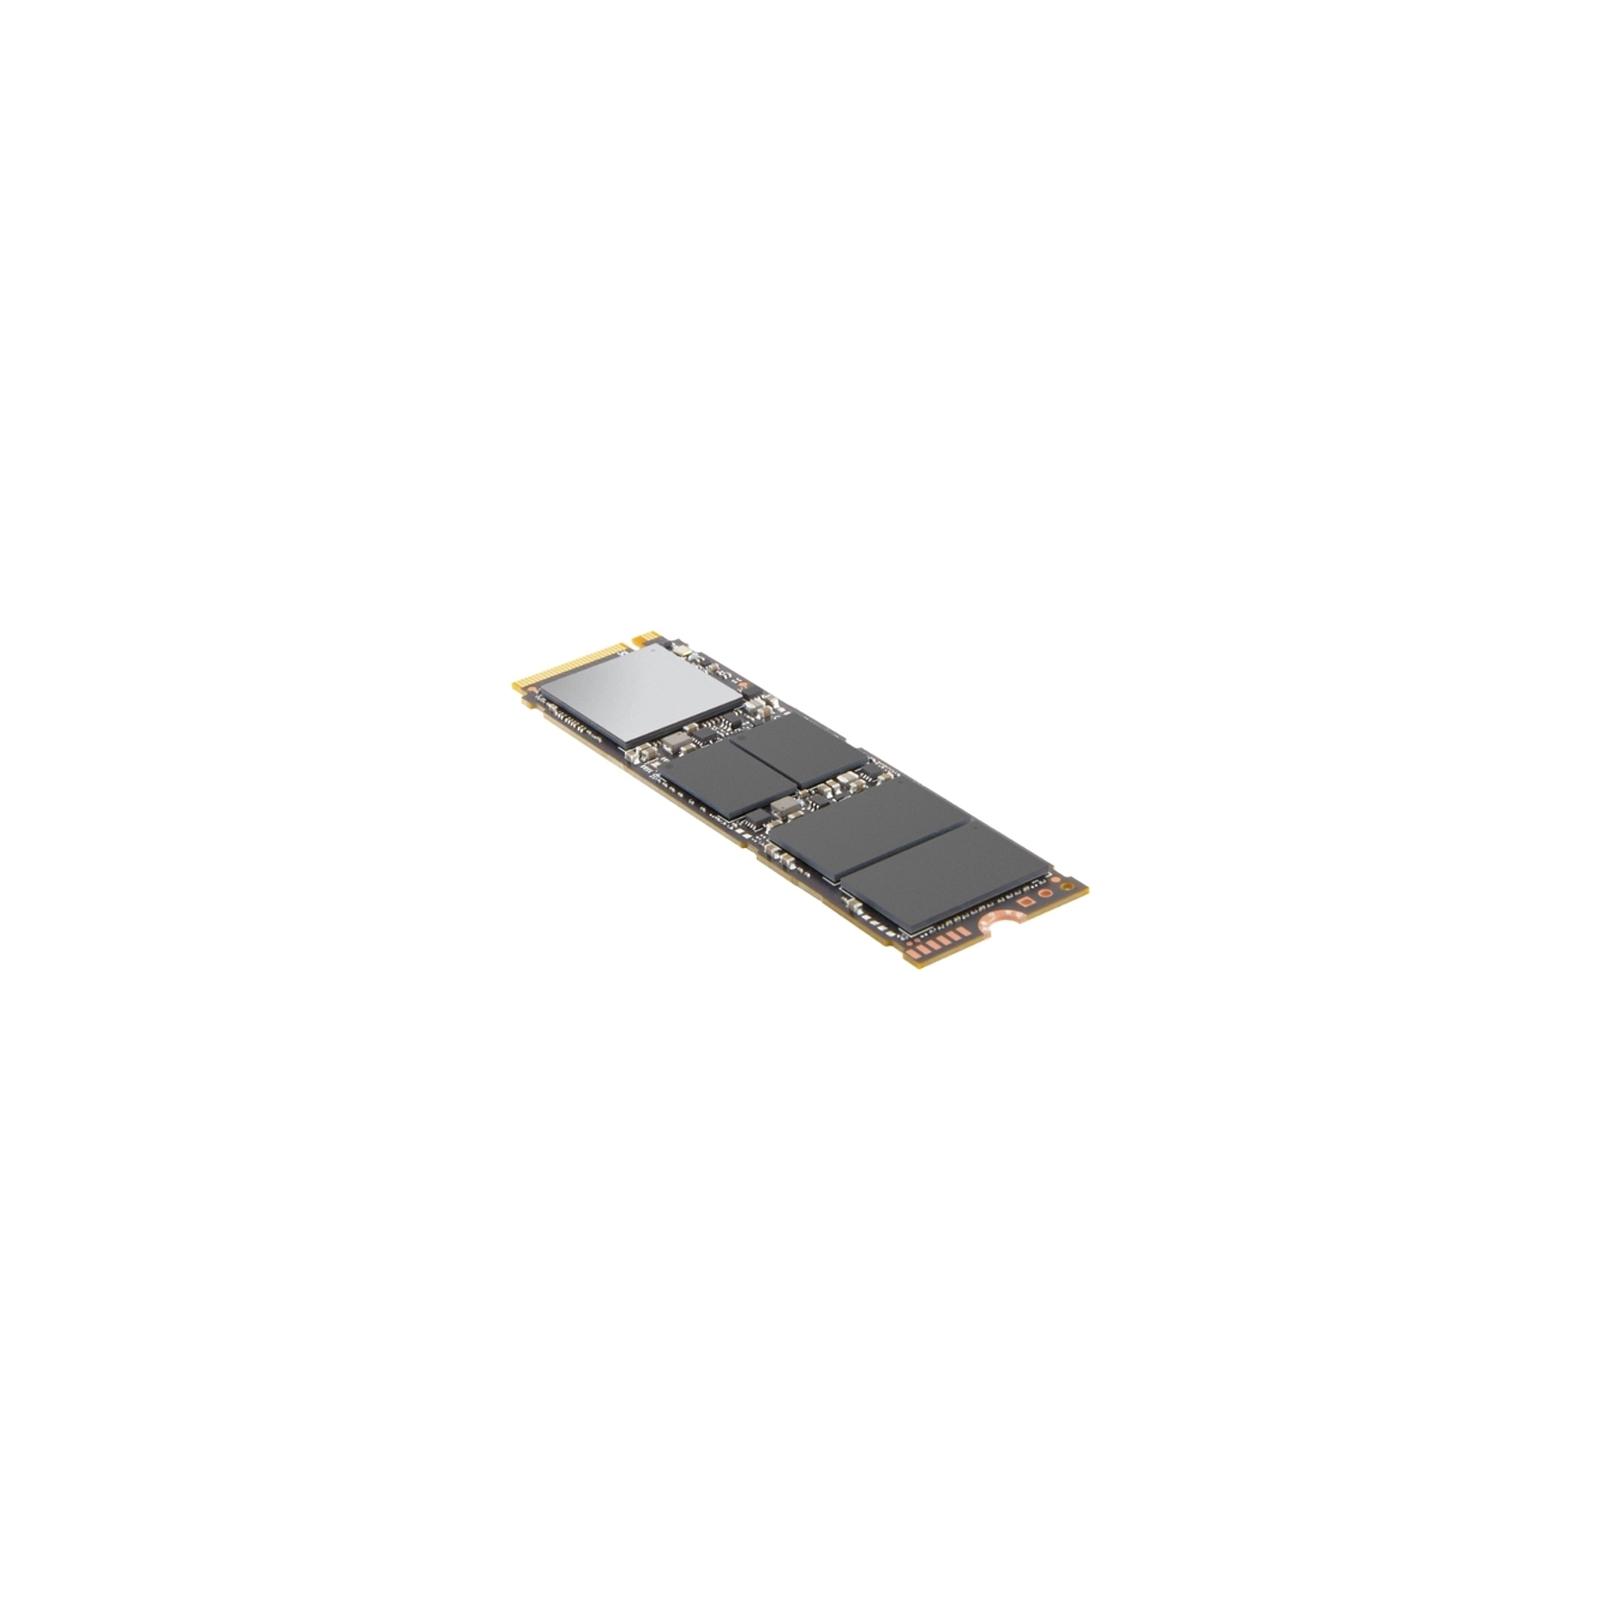 Накопитель SSD M.2 2280 128GB INTEL (SSDPEKKW128G8XT) изображение 2